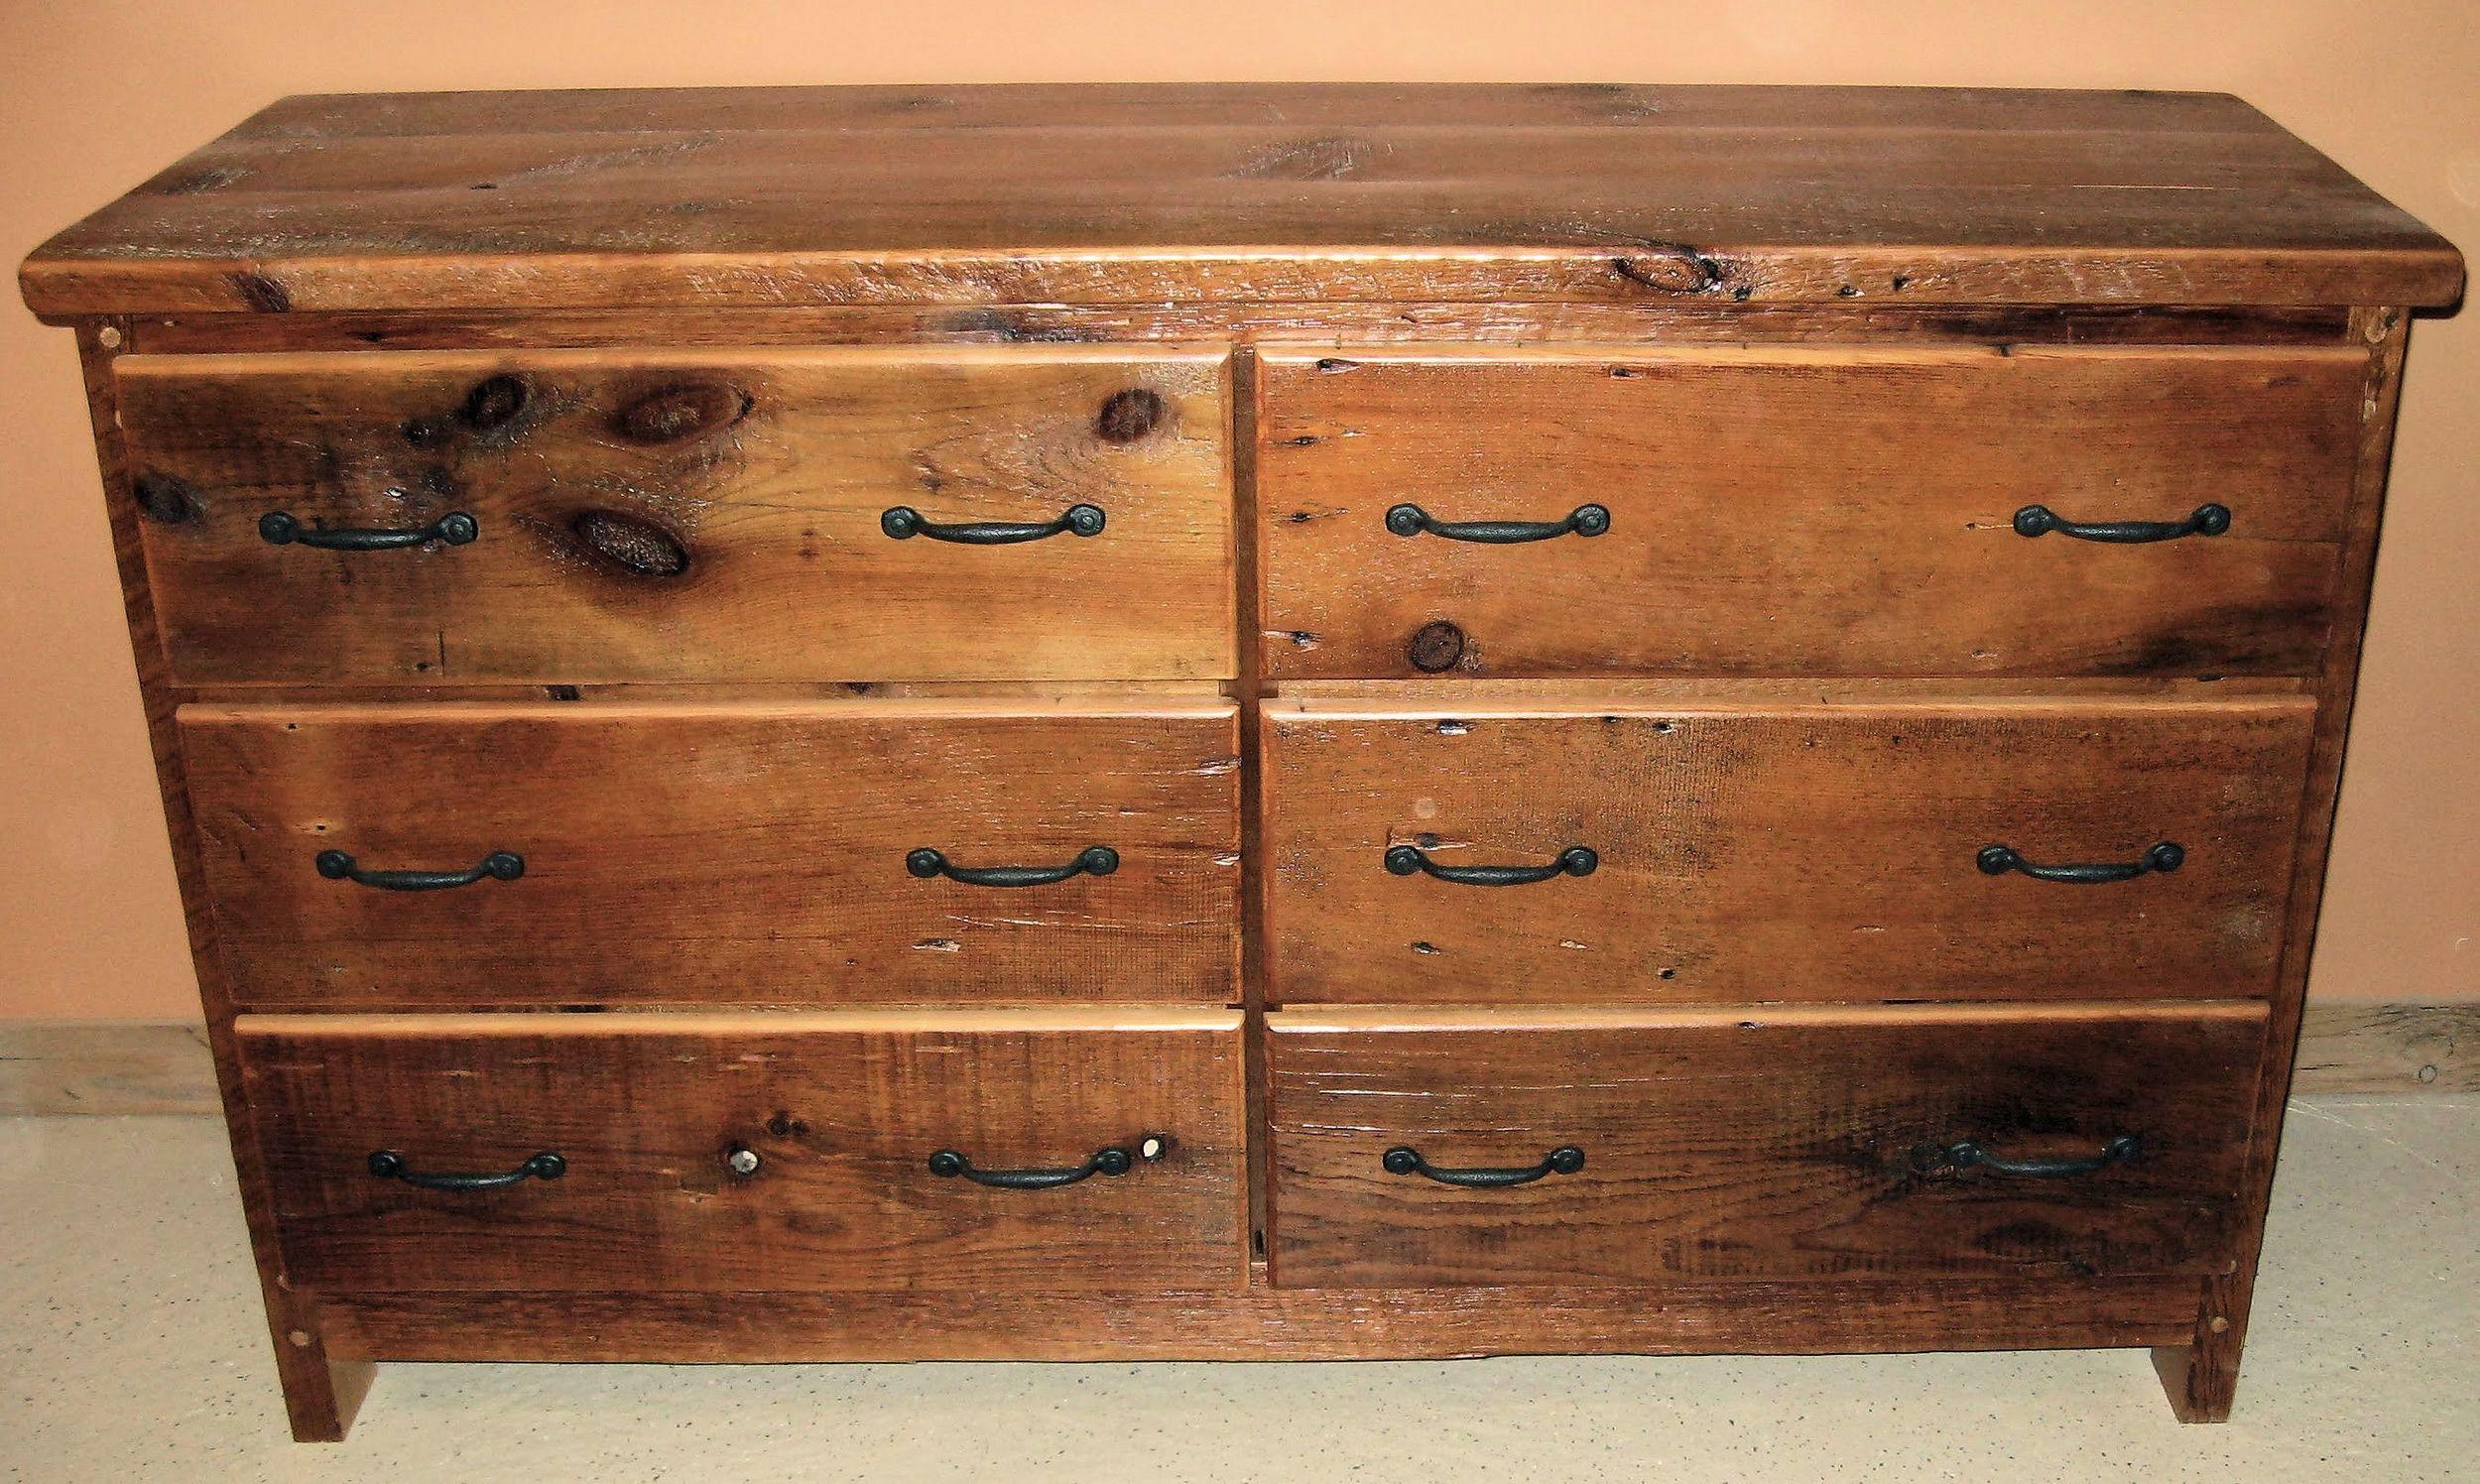 Barn Wood Dresser 6 Drawer.jpg